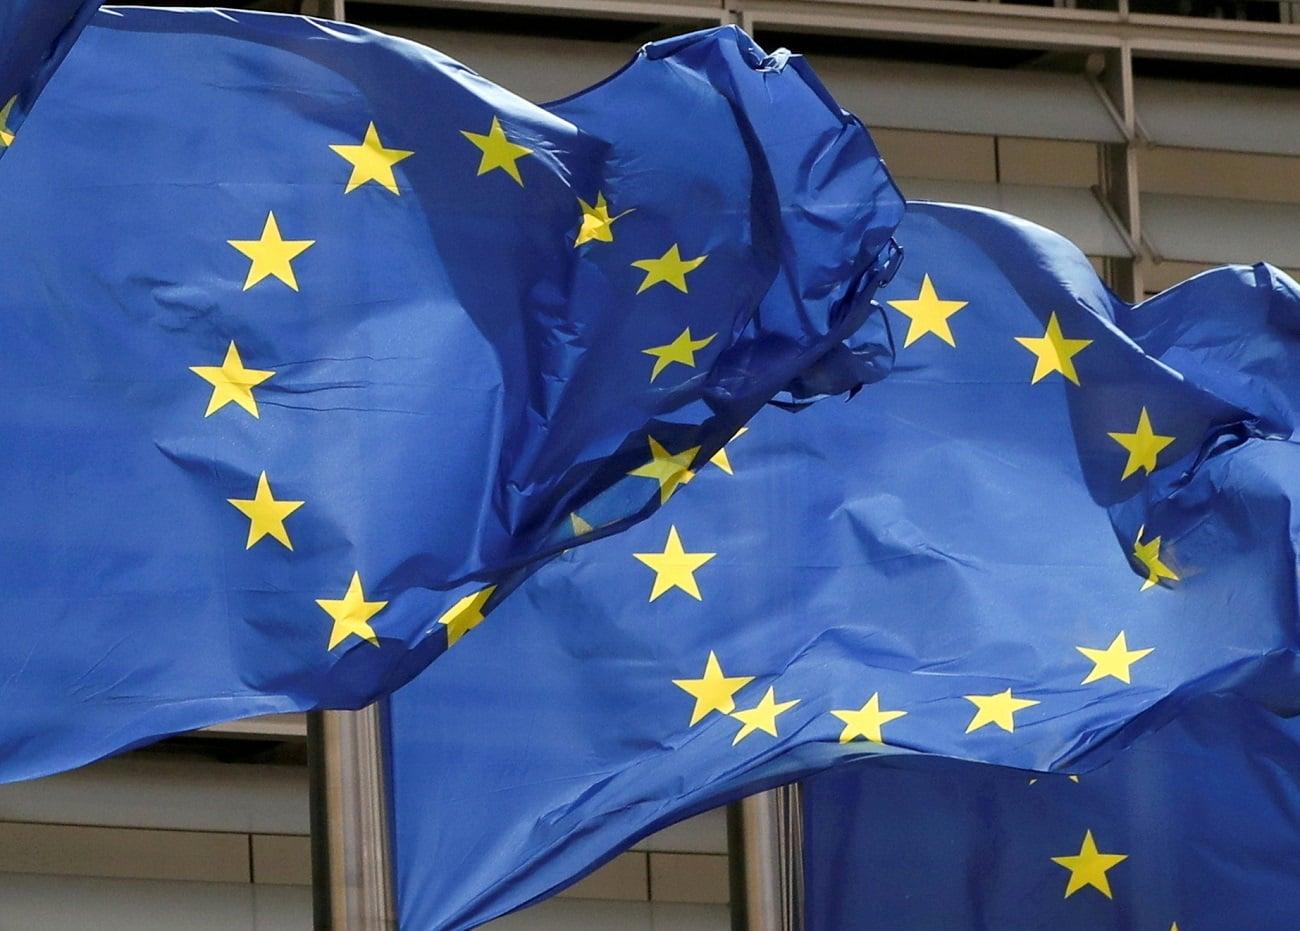 rescate empresas Europa ego egoísmo egoístas